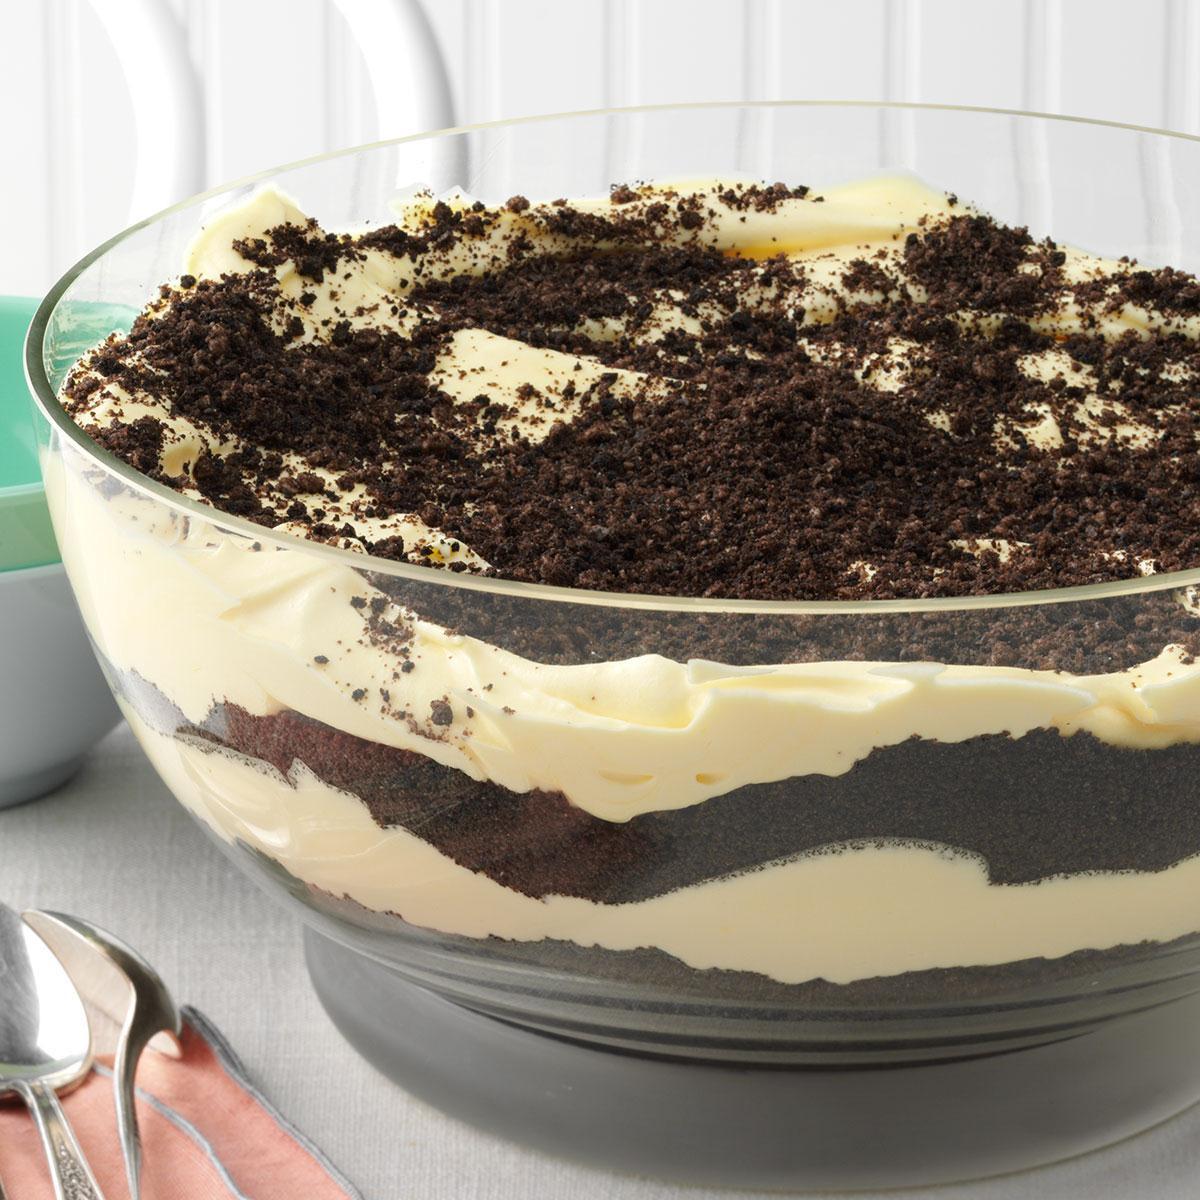 Oreo Dirt Cake Recipe  Pay Dirt Cake Recipe